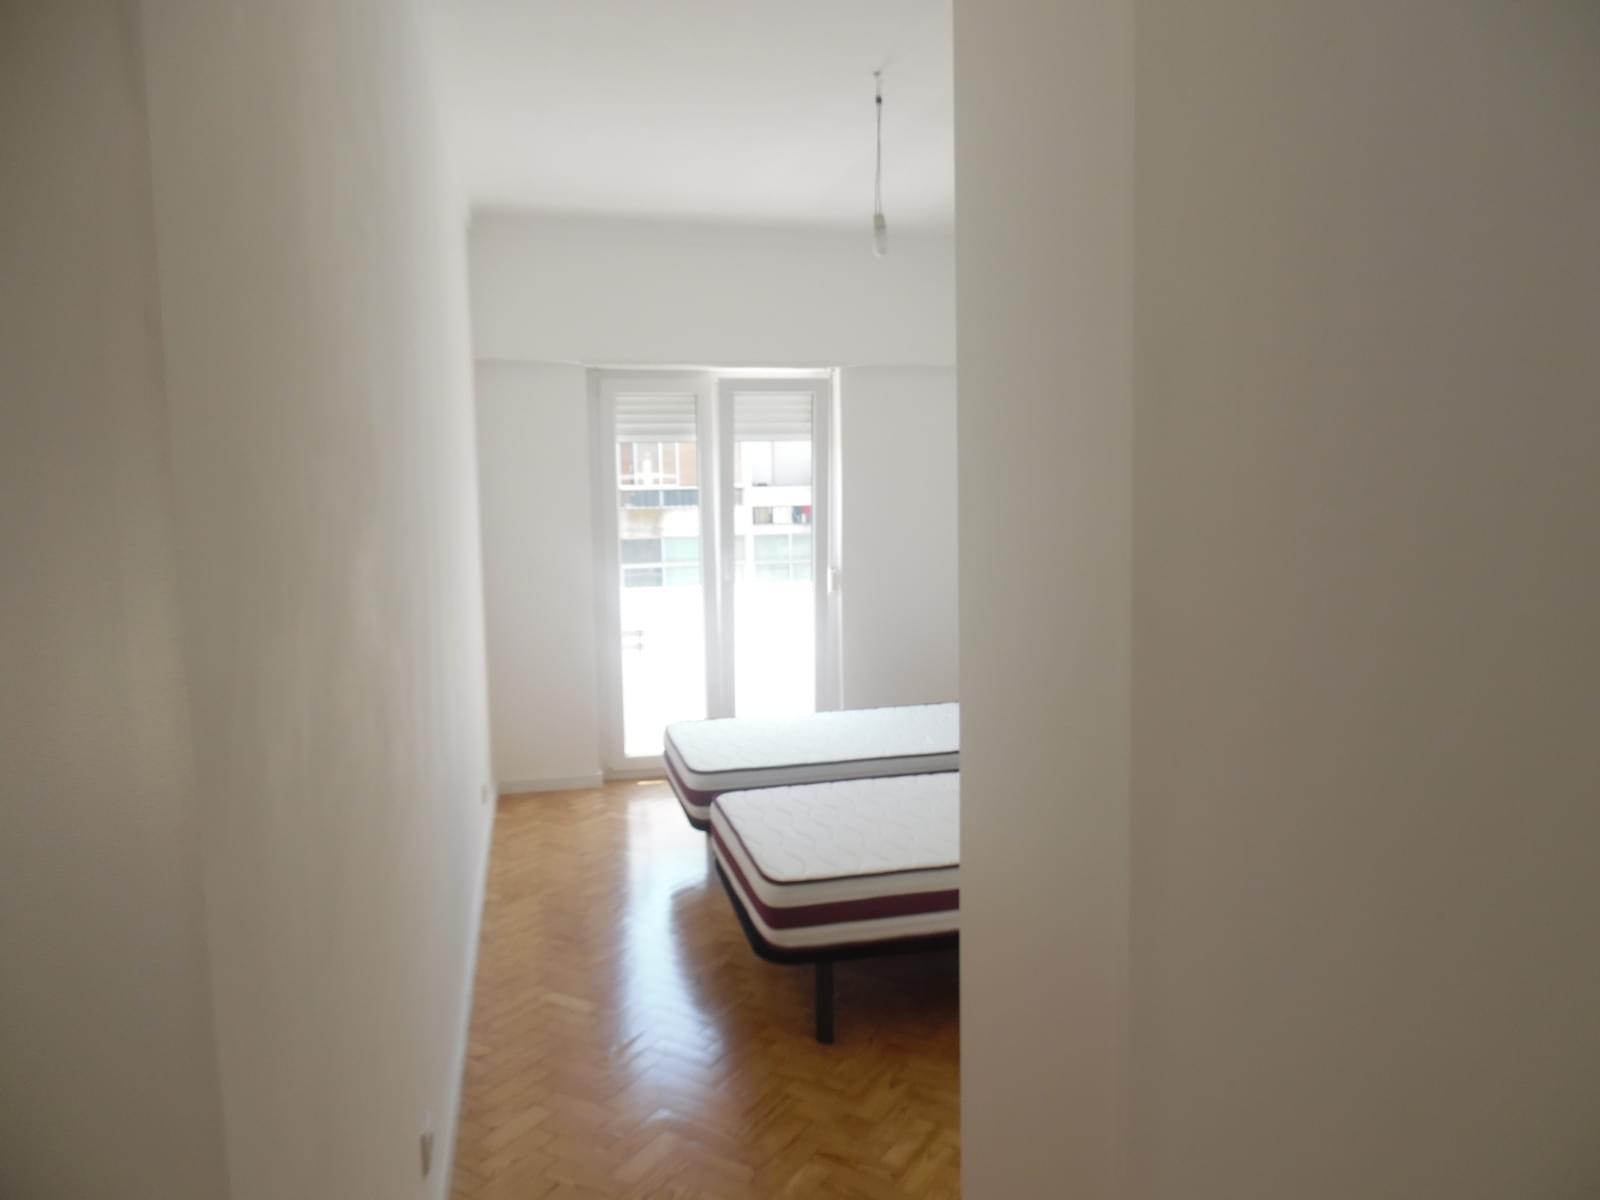 pf17256-apartamento-t2-lisboa-c4e02185-339c-4b5a-a412-791f2313b8cb